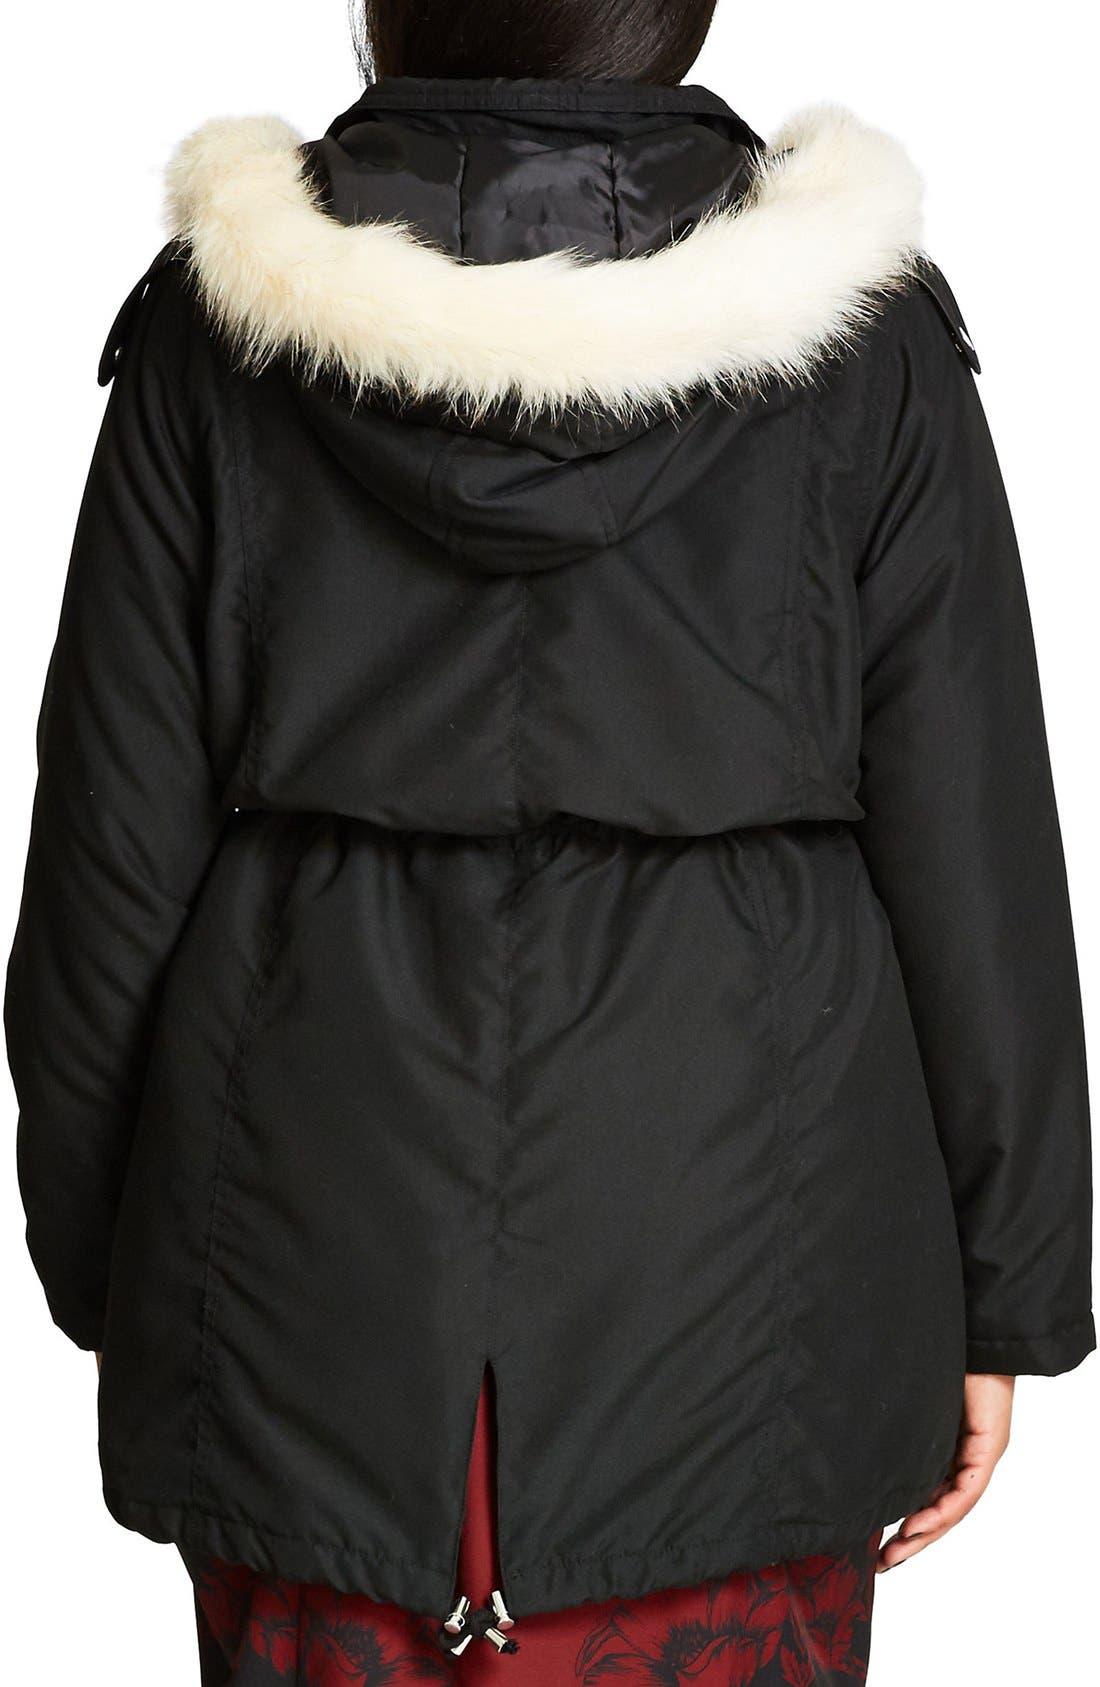 Alternate Image 3  - City Chic 'London Look' Faux Fur Trim Hooded Parka (Plus Size)